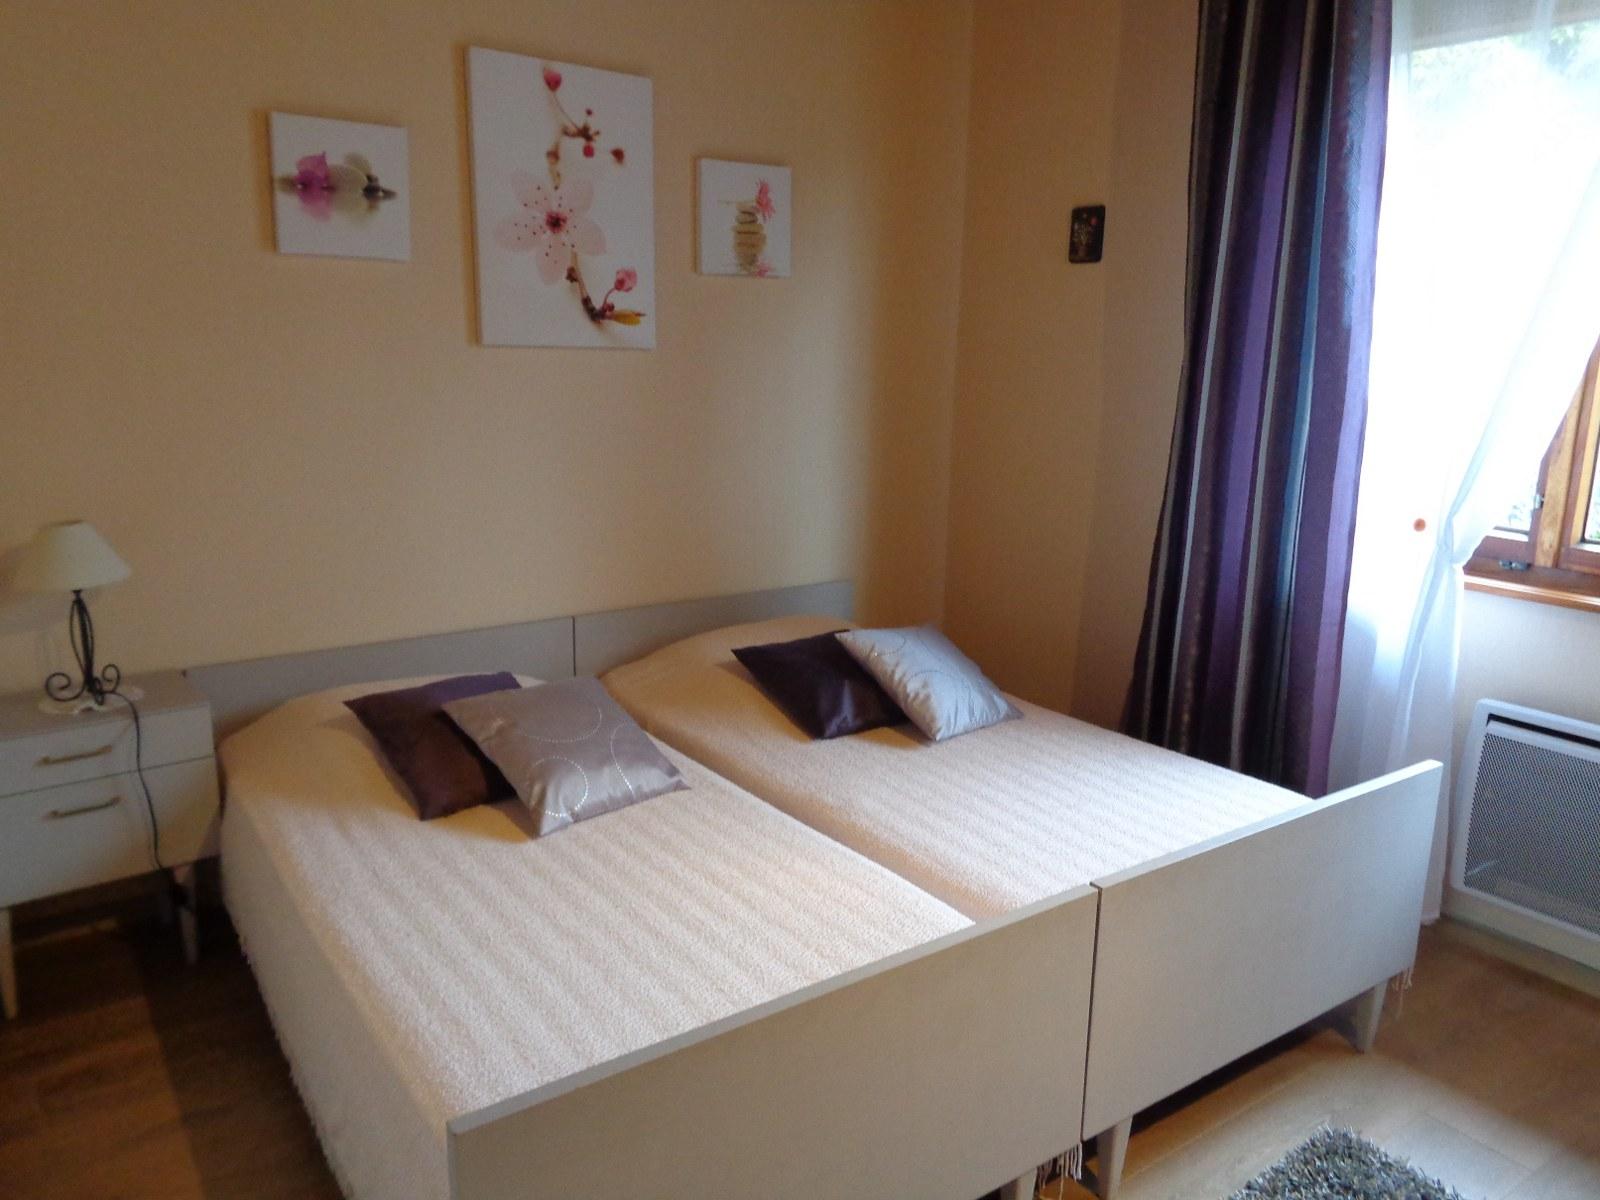 meubl de mme nathalie steinmetz fleck. Black Bedroom Furniture Sets. Home Design Ideas